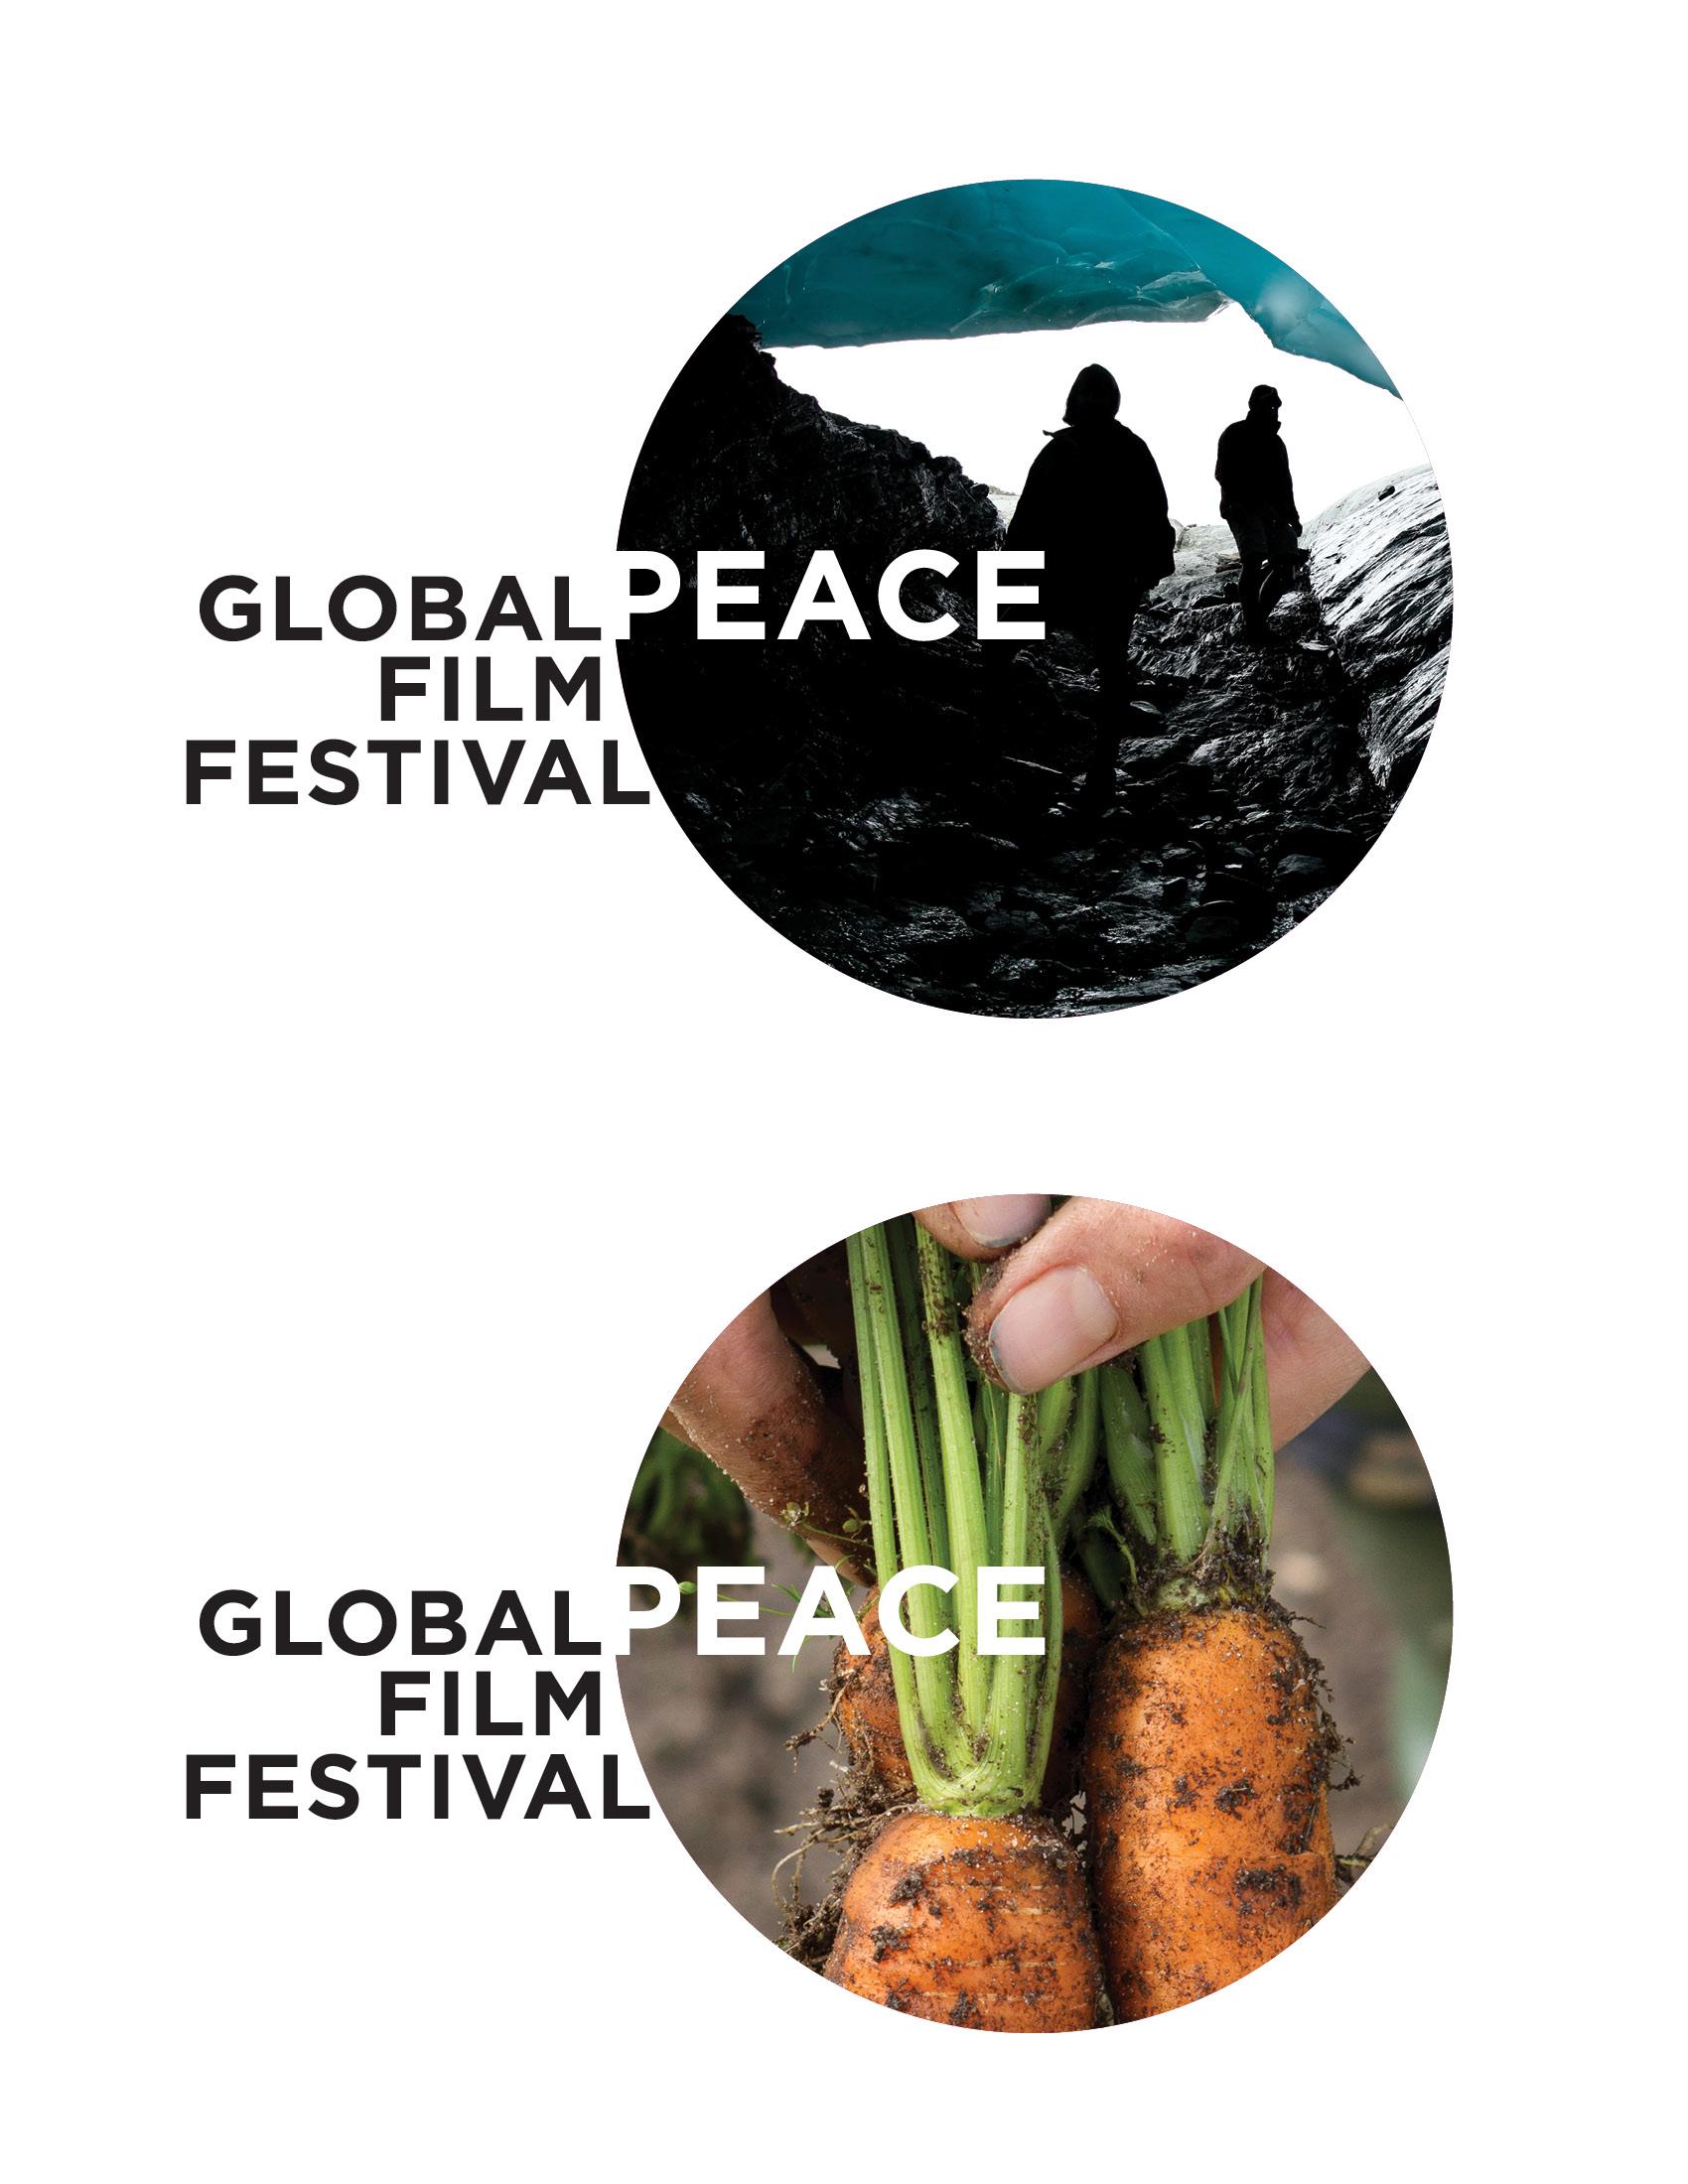 Global Peace Film Festival Rebrand